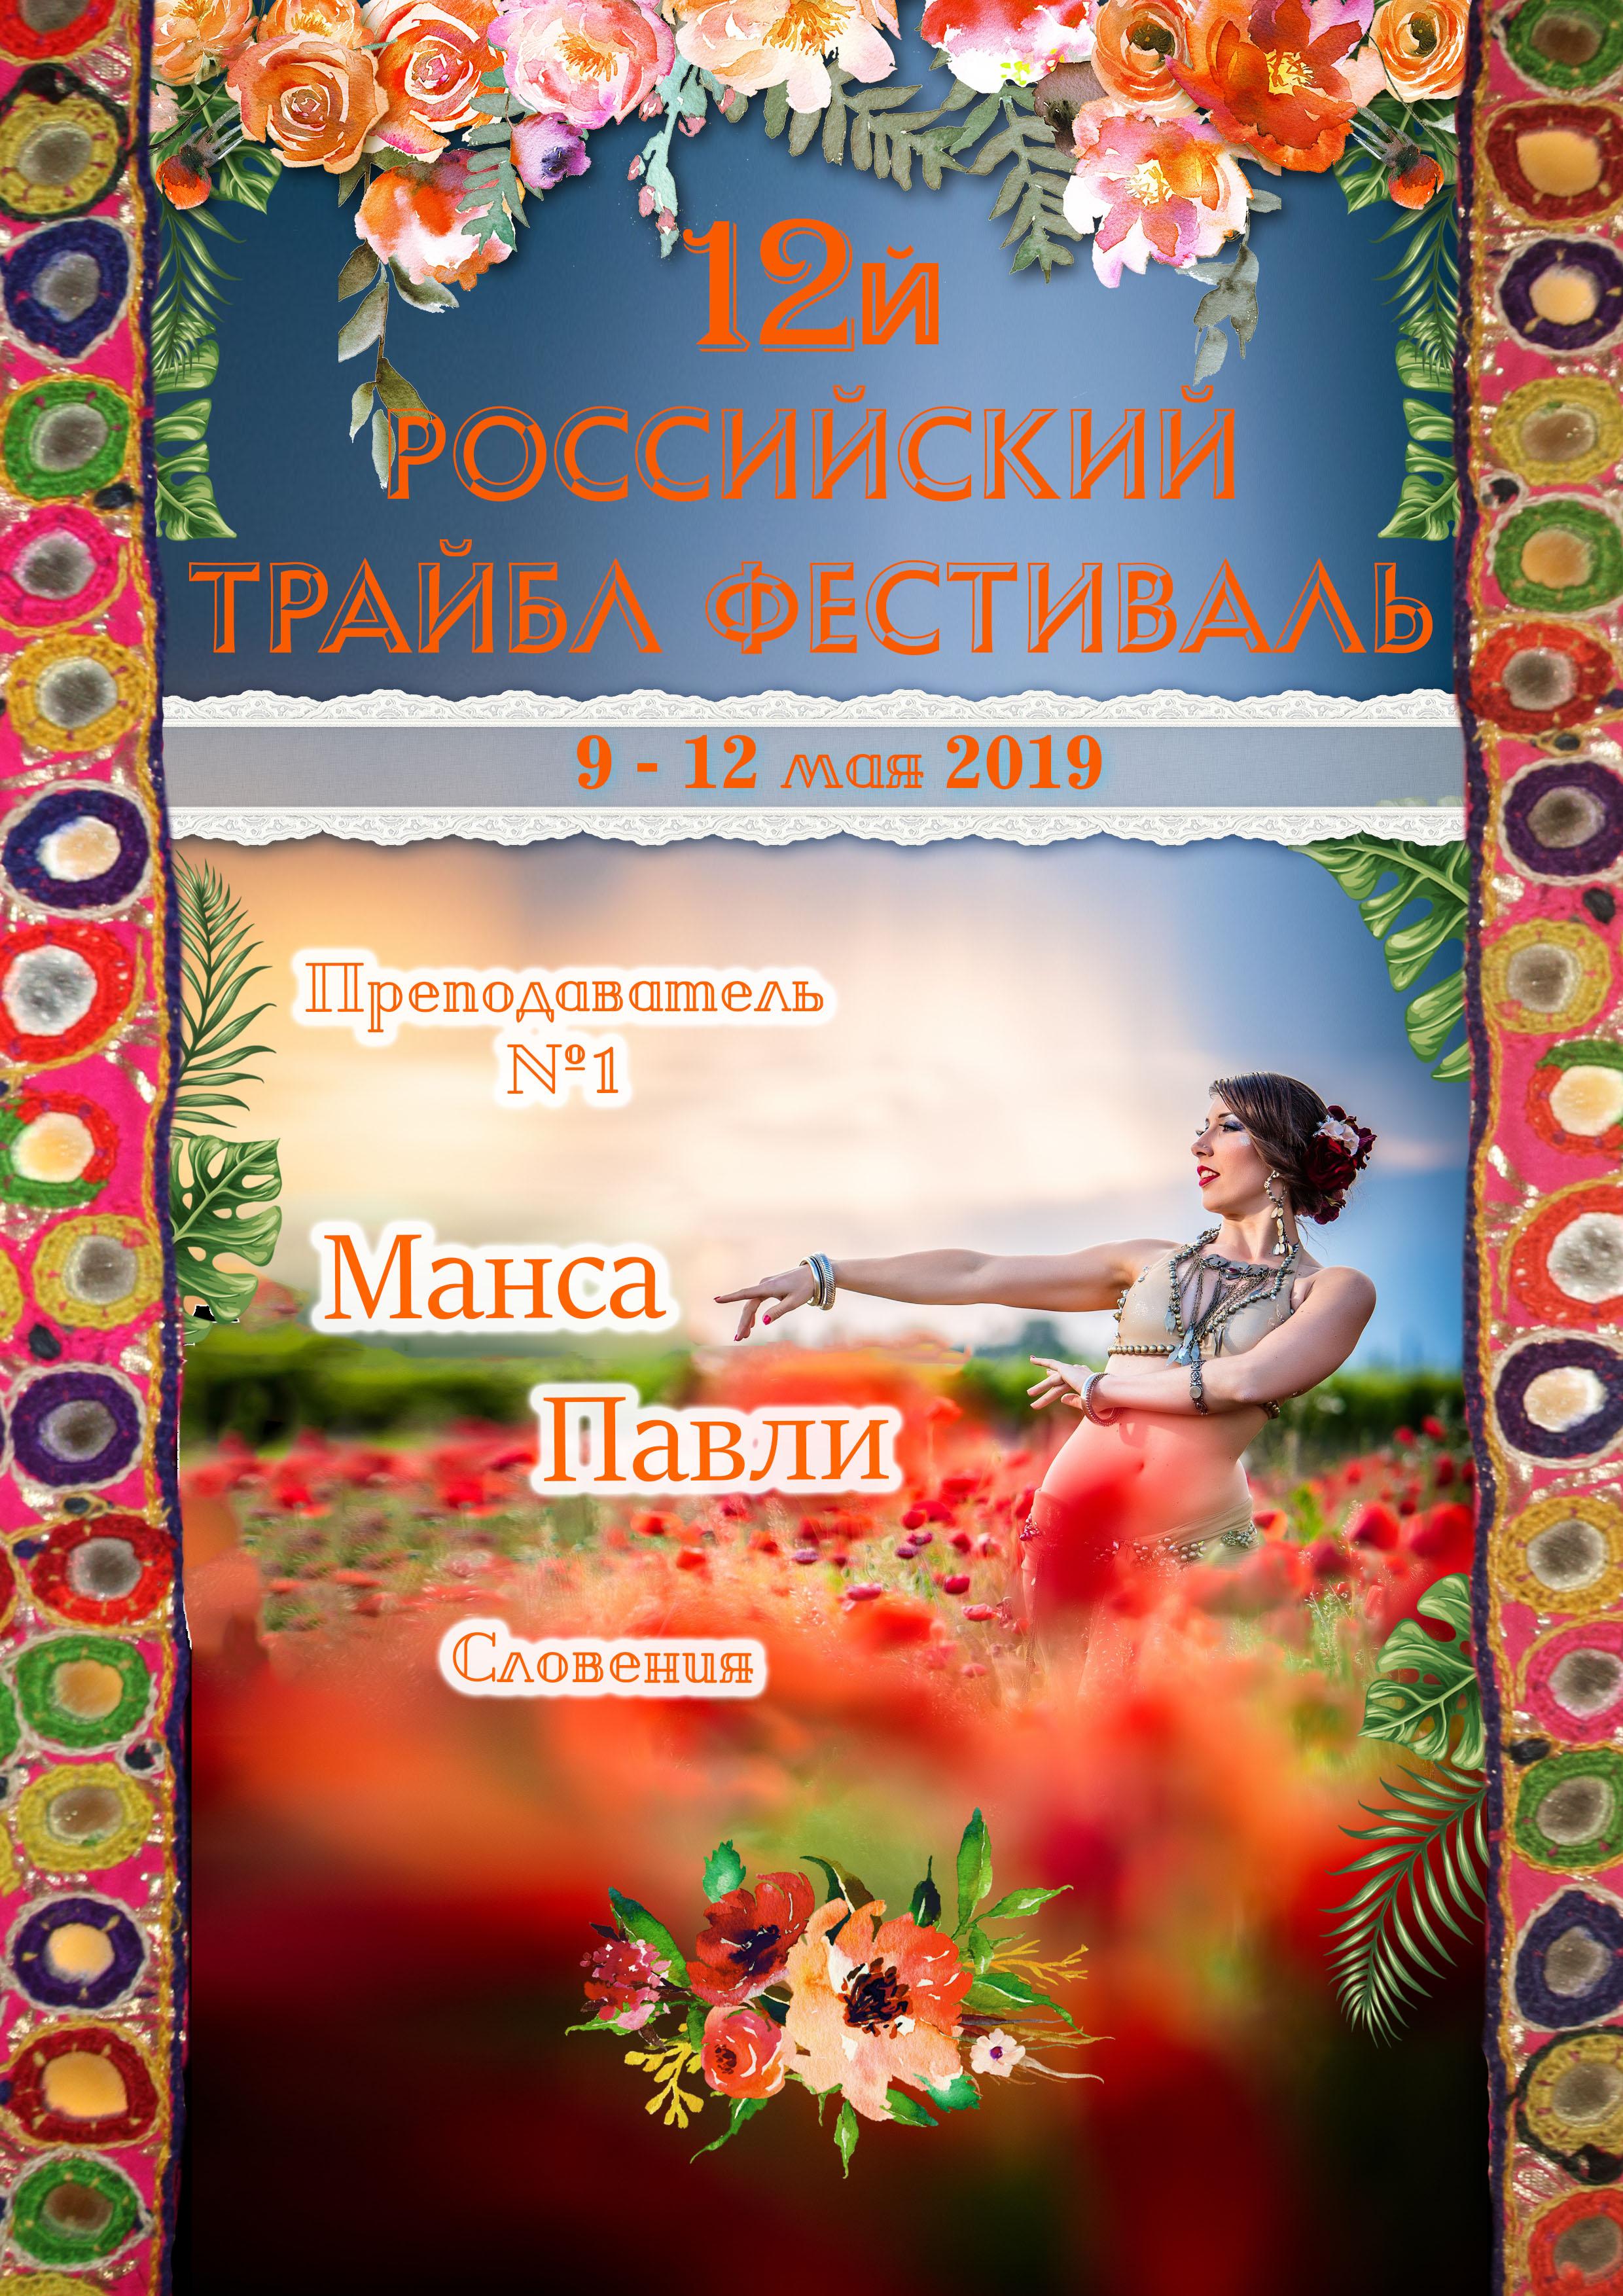 Манса Павли